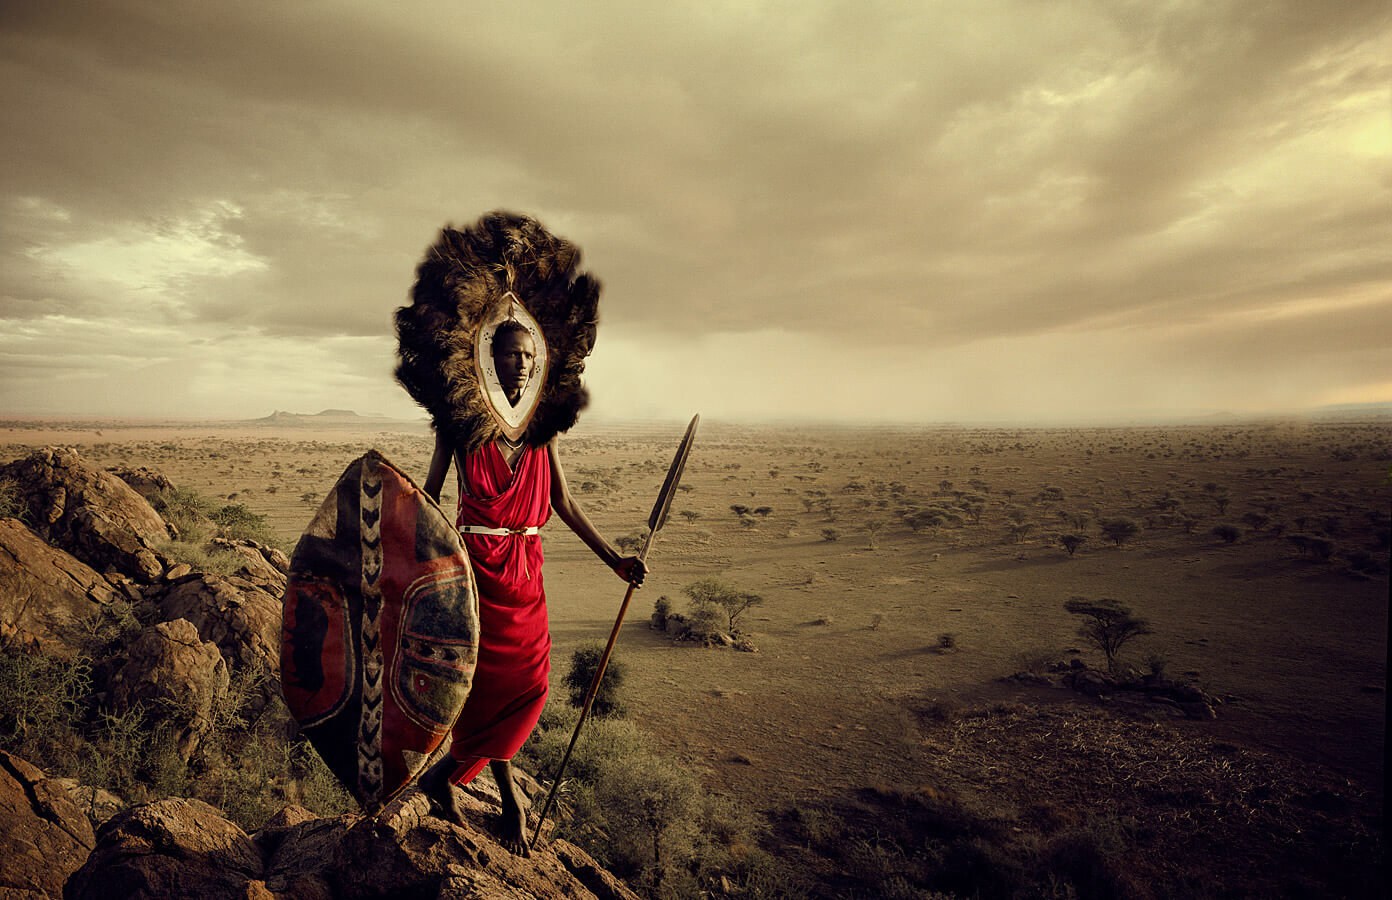 predstavitel-masaev